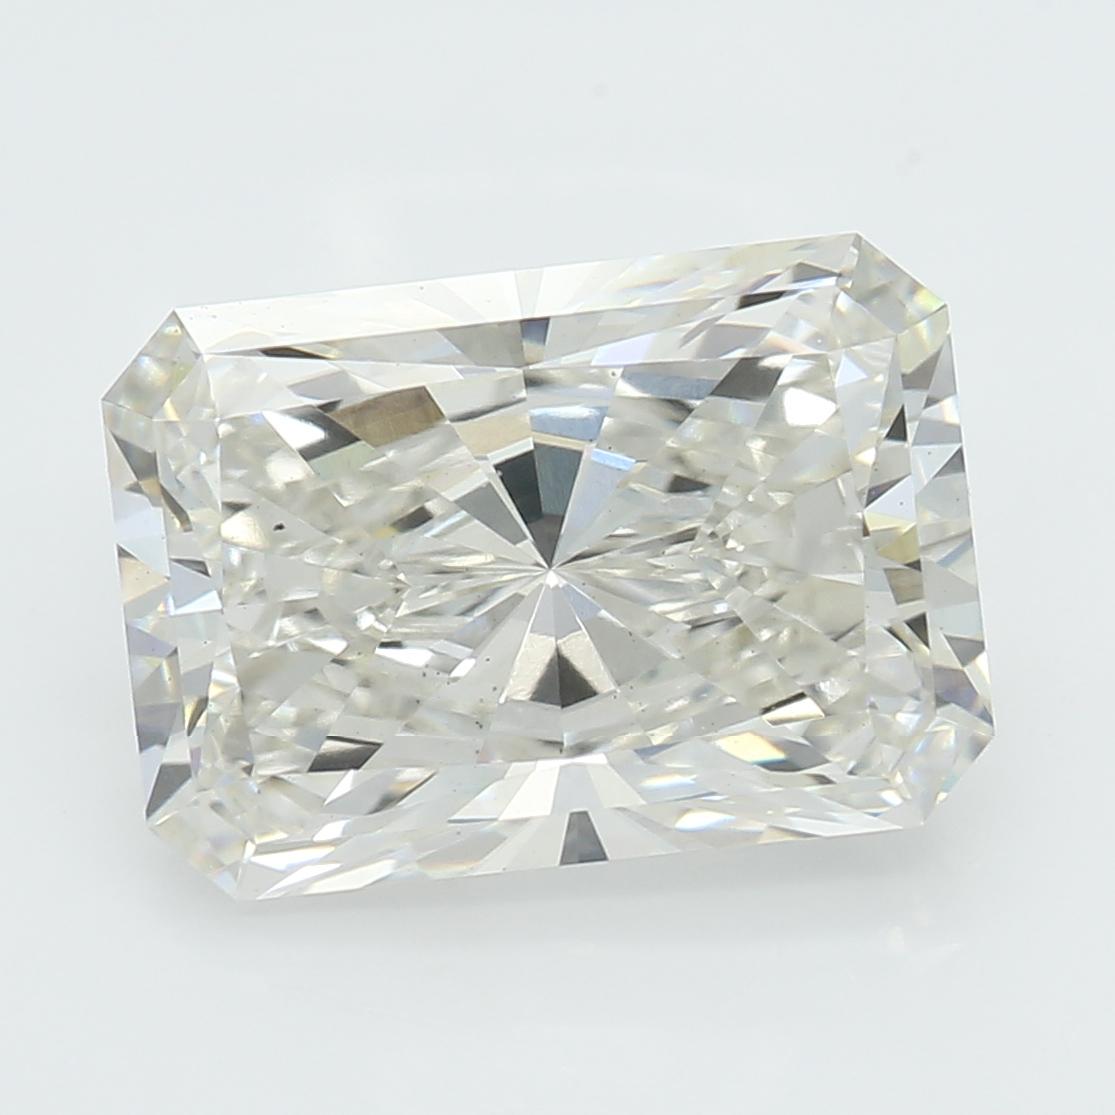 2.46 Carat J-VS2 Excellent Radiant Diamond